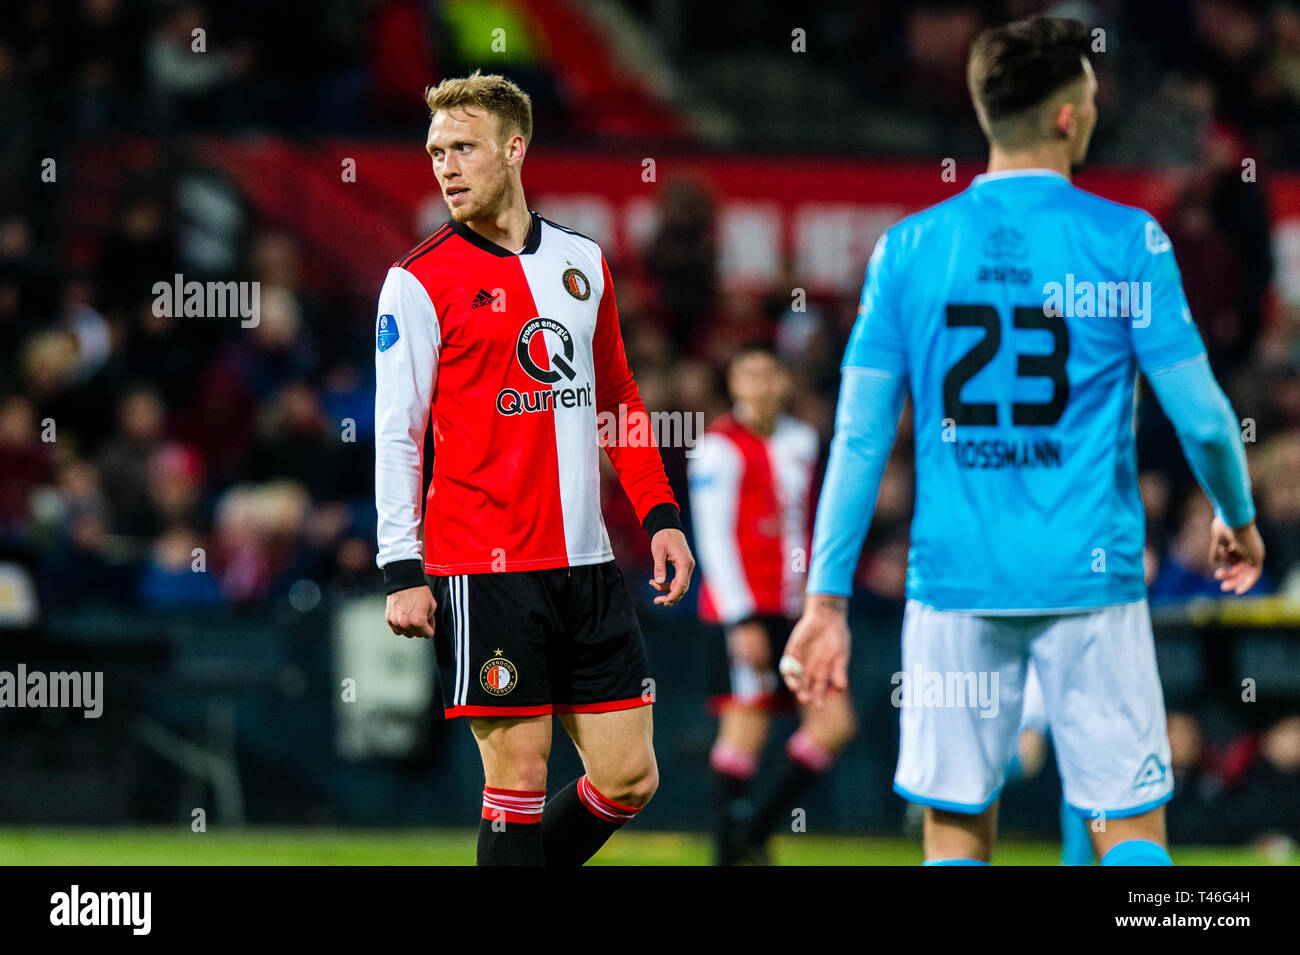 13th of april 2019 Rotterdam, The Netherlands Soccer Dutch Eredivisie Feyenoord v Heracles Almelo  Feyenoord player Nicolai Jorgensen - Stock Image